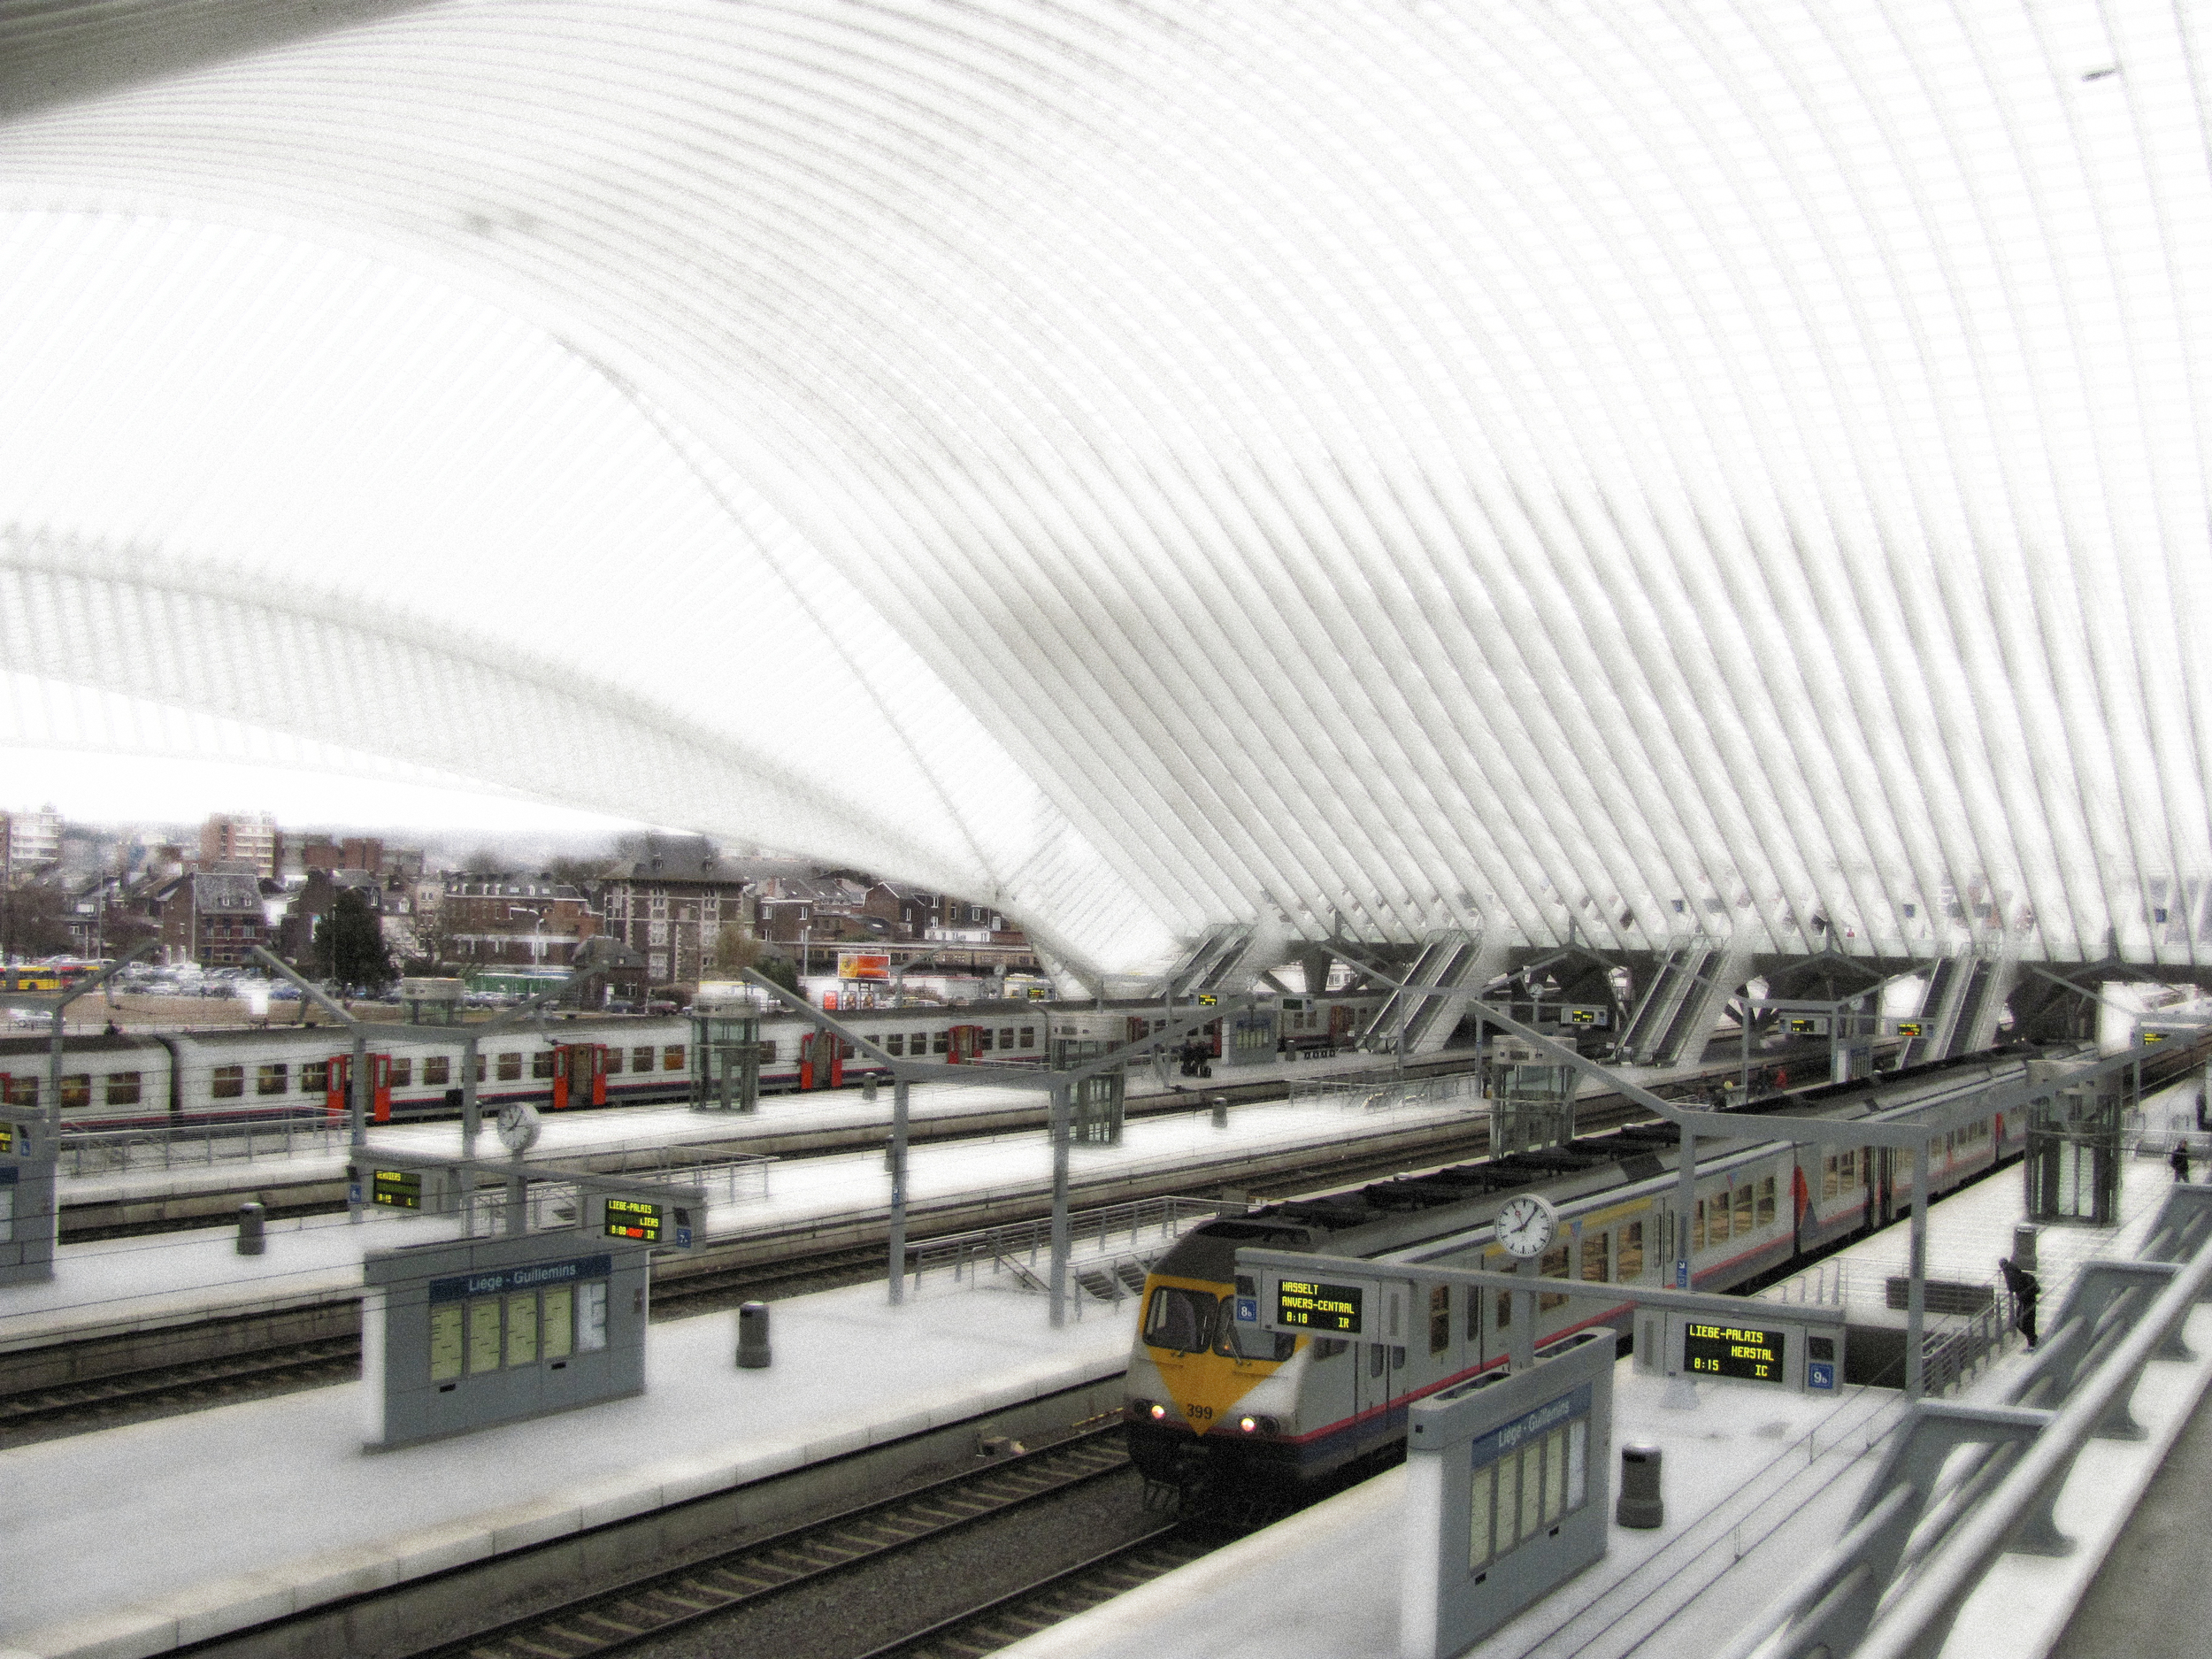 Great Hall 2 Platforms, Train Station, Liege, 2010